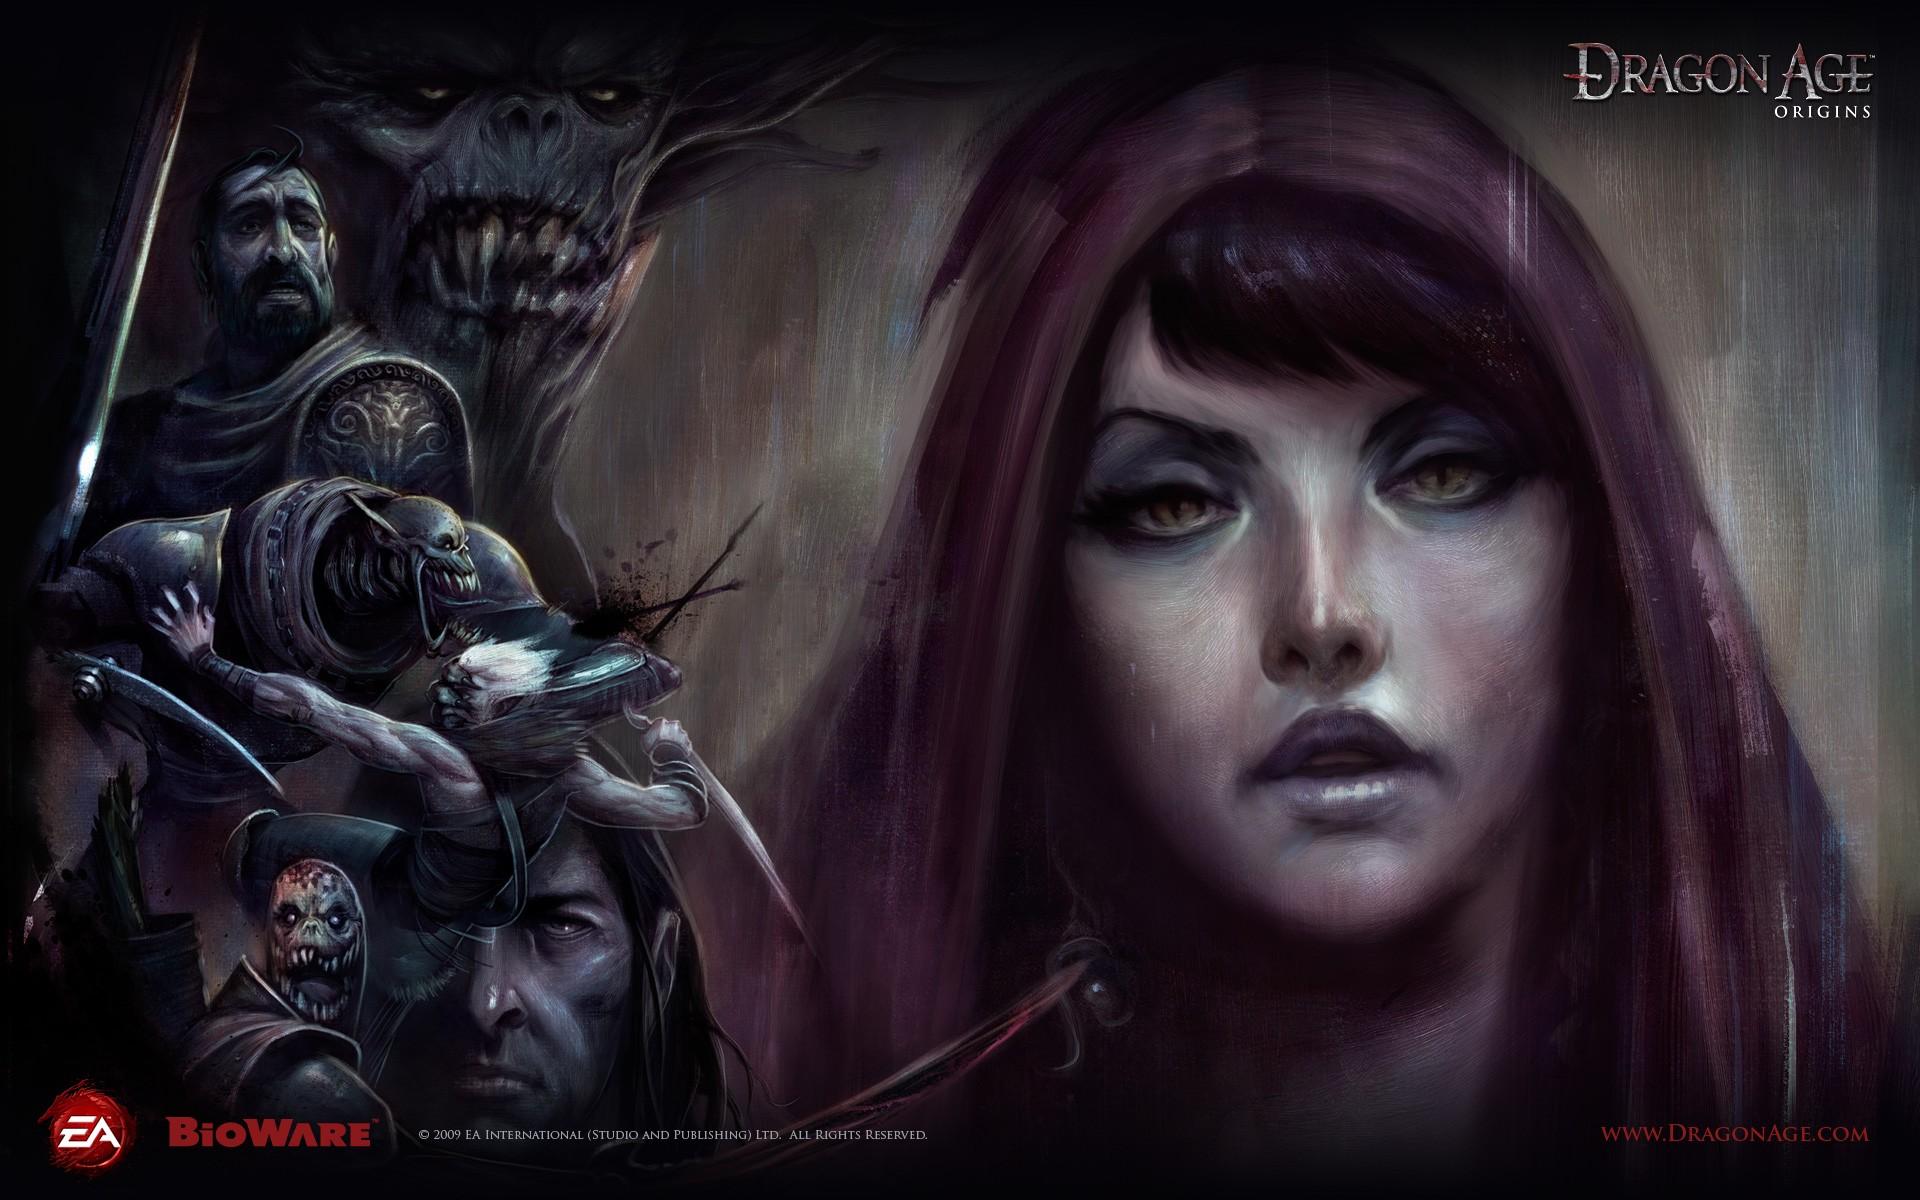 Wallpaper Video Games Comics Dragon Age Dragon Age Origins